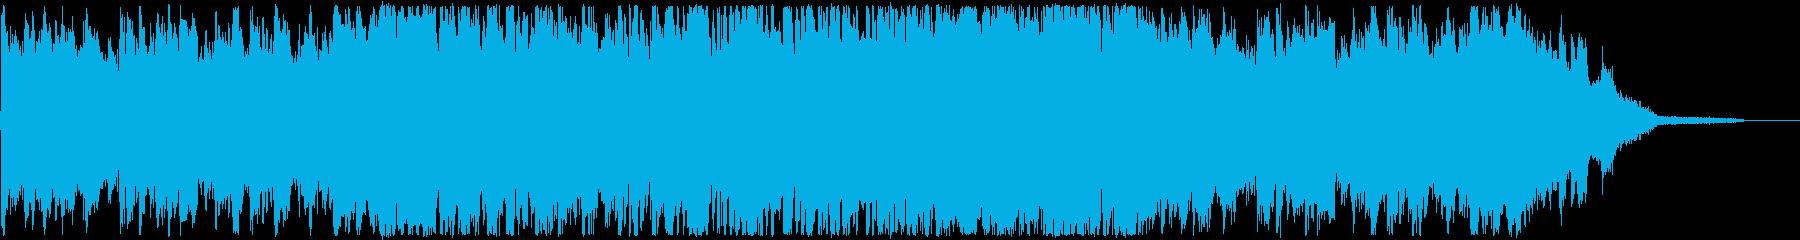 CM・おしゃれな洋楽R&Bの再生済みの波形